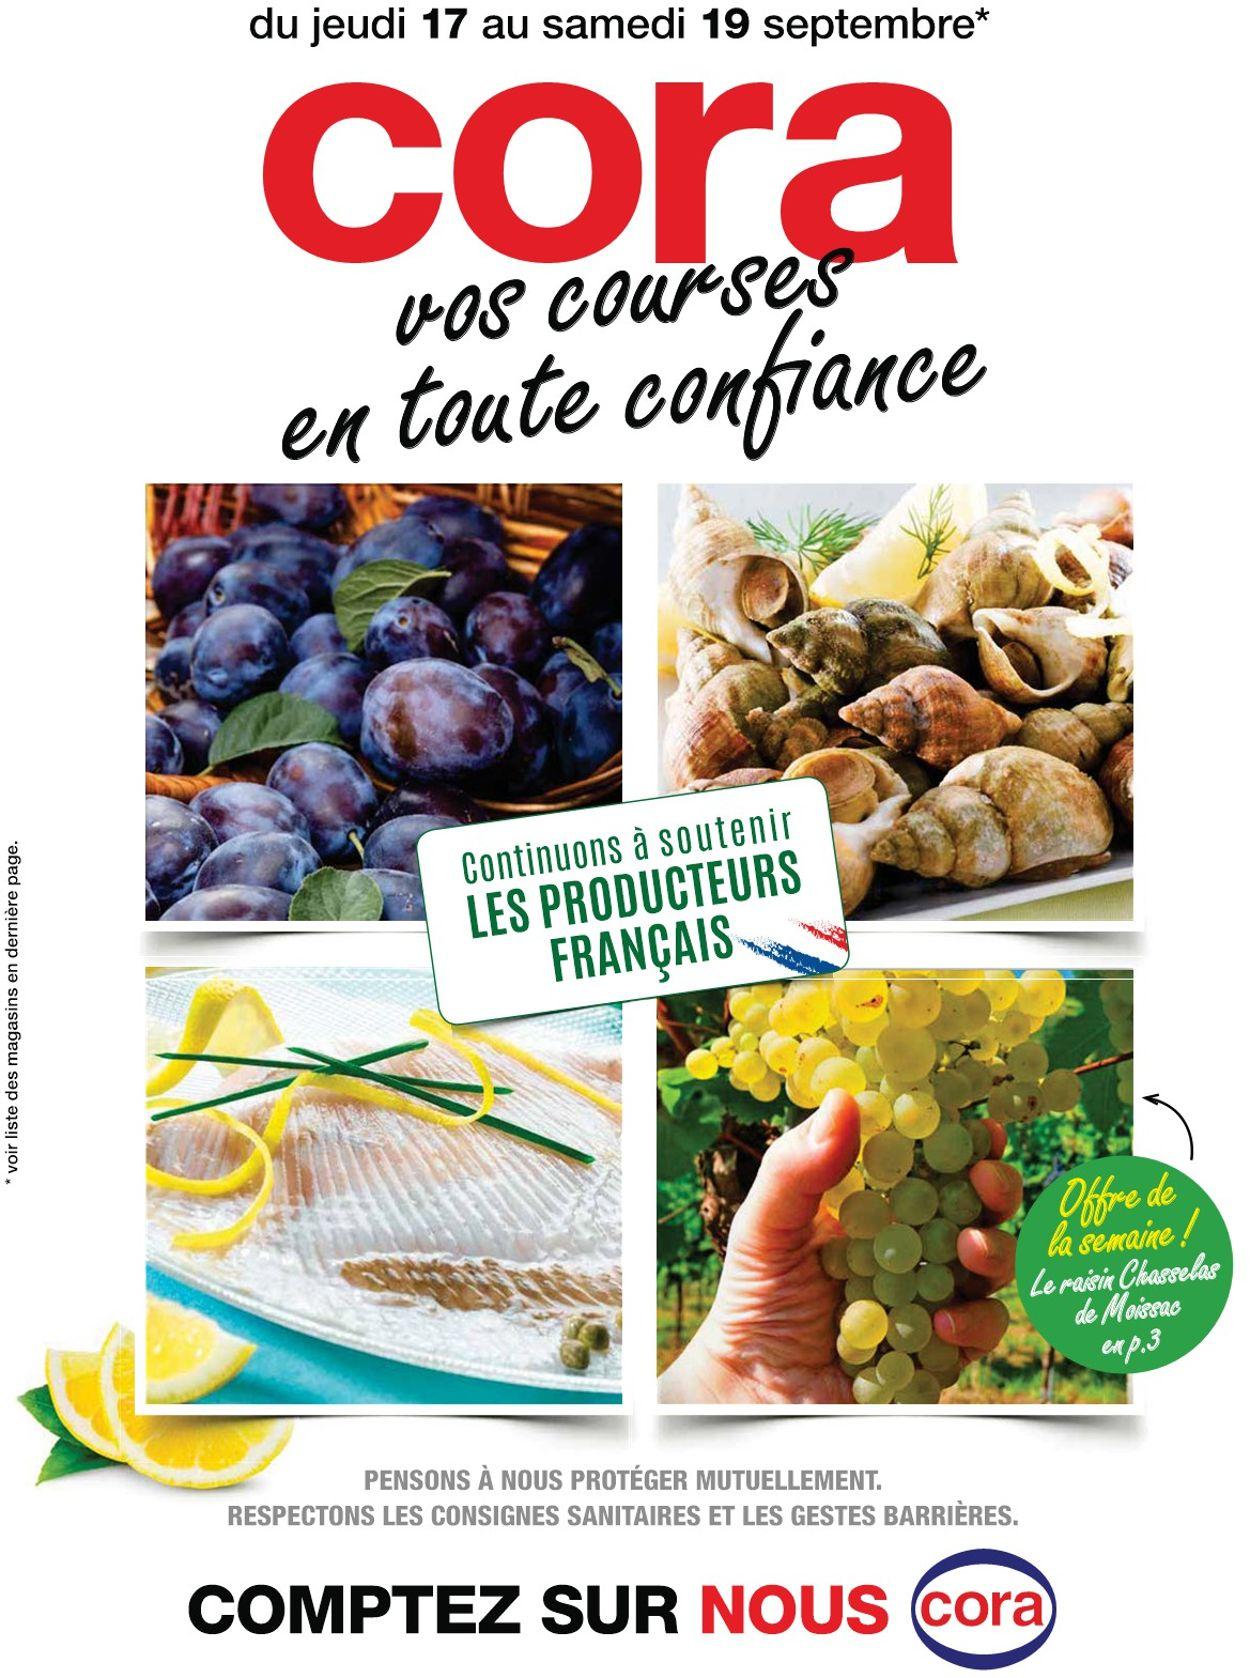 Cora Catalogue - 17.09-19.09.2020